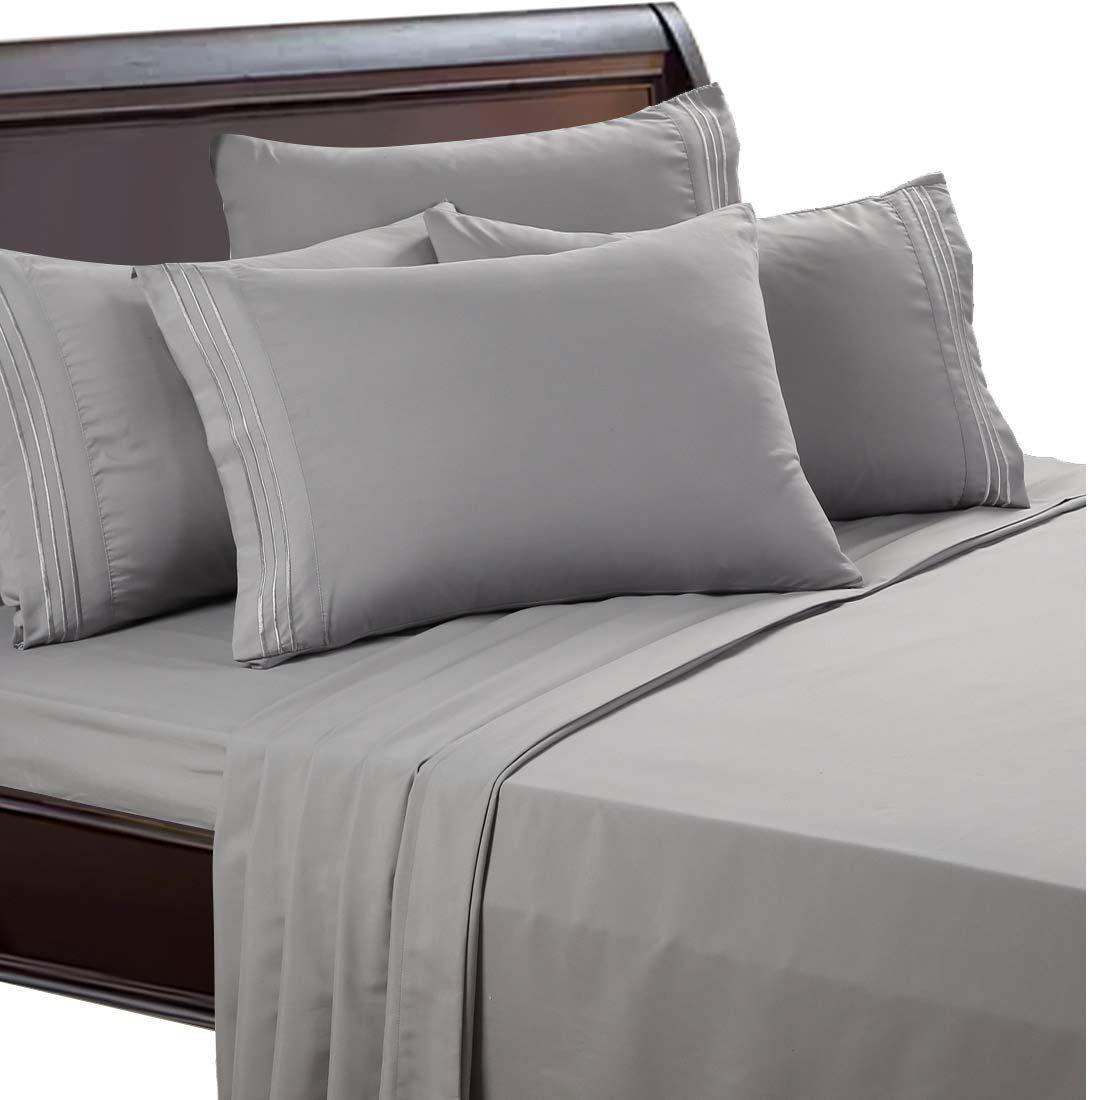 2019 1800 Thread Count Microfiber Bed Sheet Duvet Cover Set Wrinkle